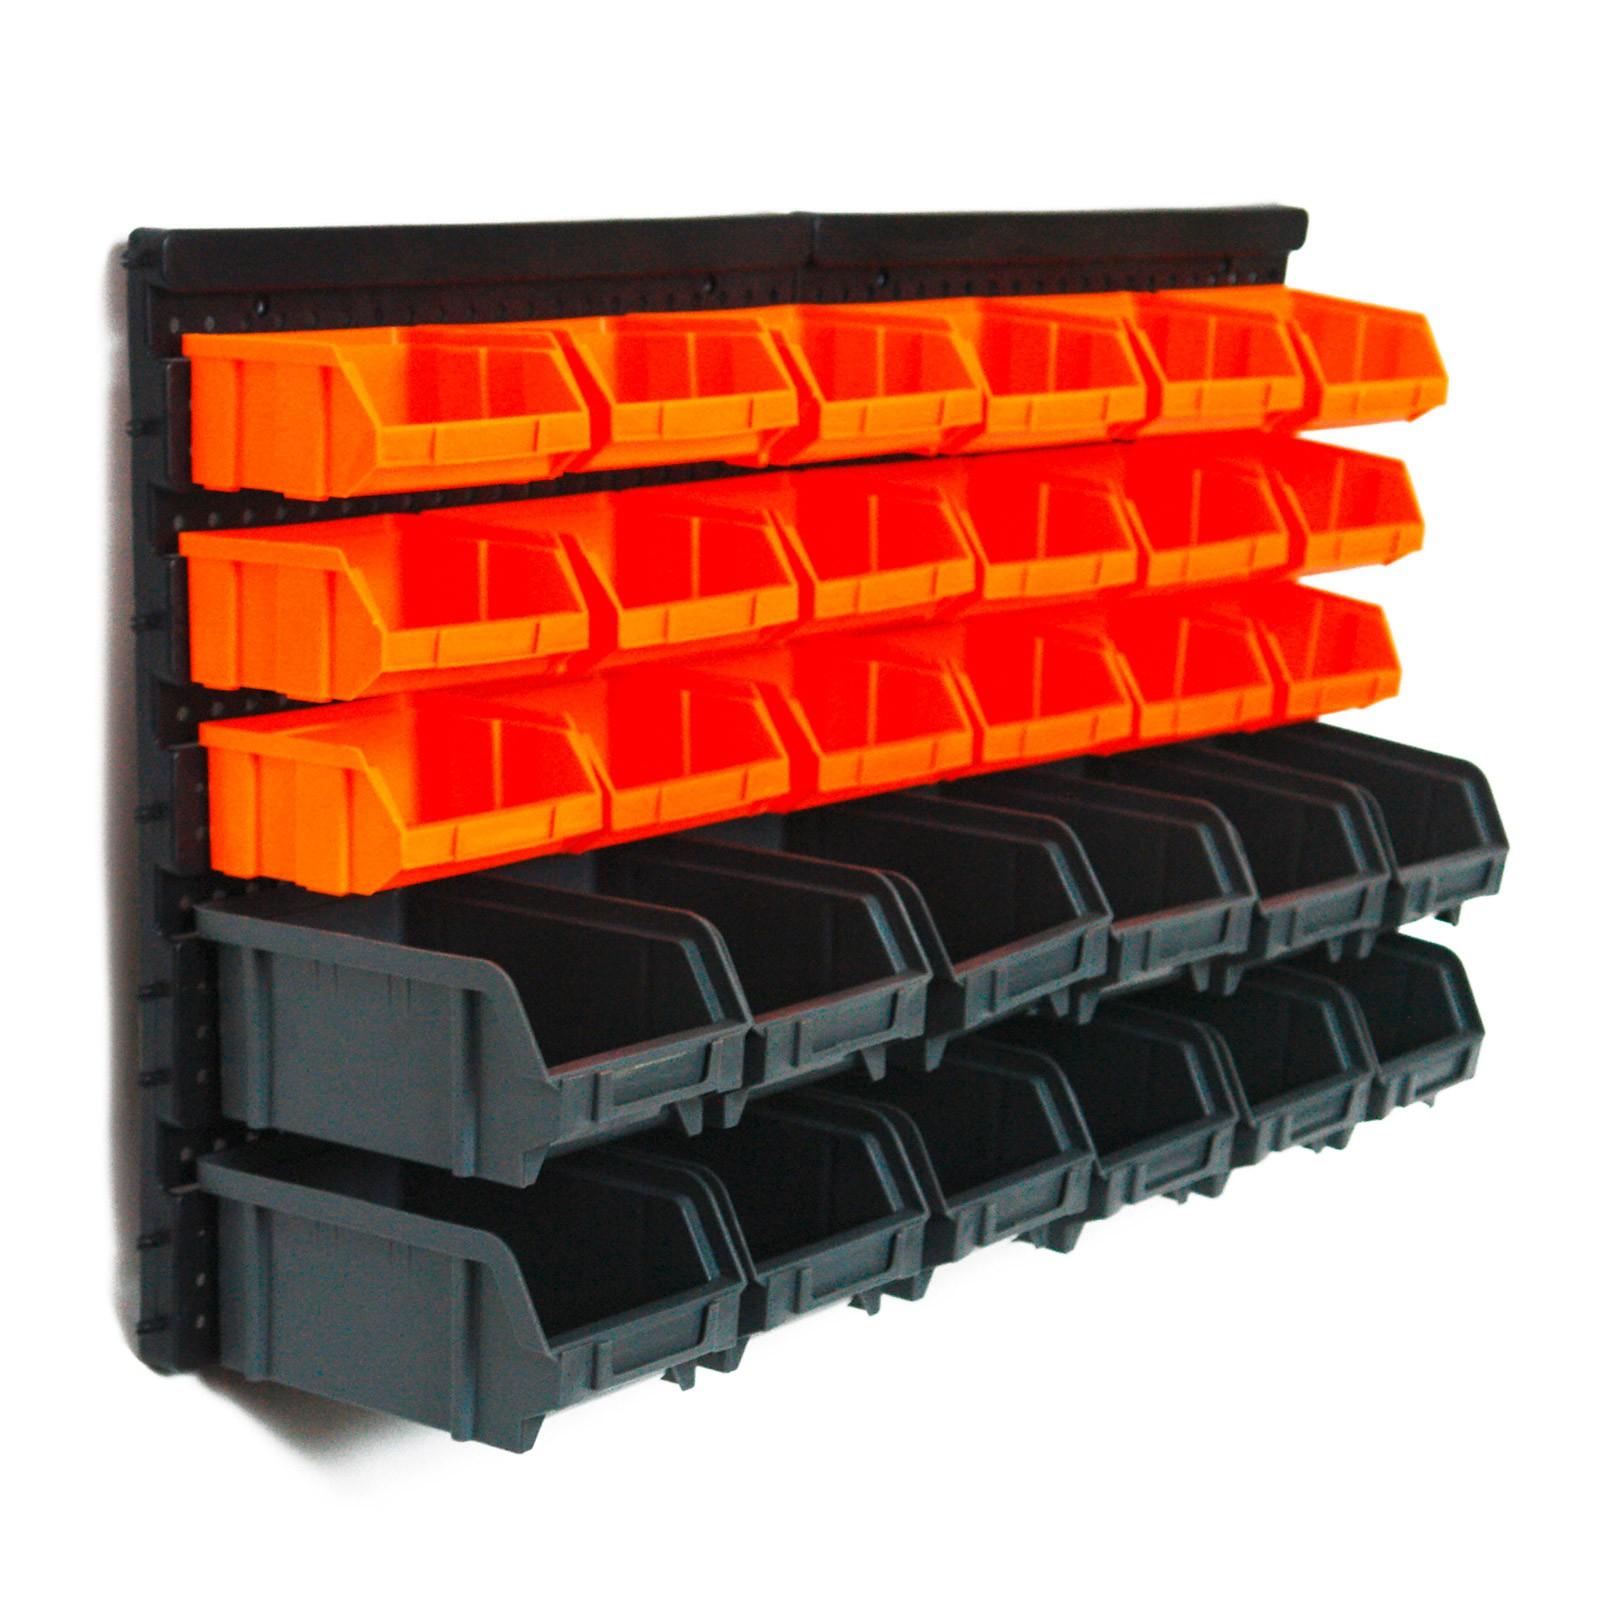 stapelboxen wandregal 30 tlg sichtlagerk sten lagerk sten lagersystem lagerregal ebay. Black Bedroom Furniture Sets. Home Design Ideas